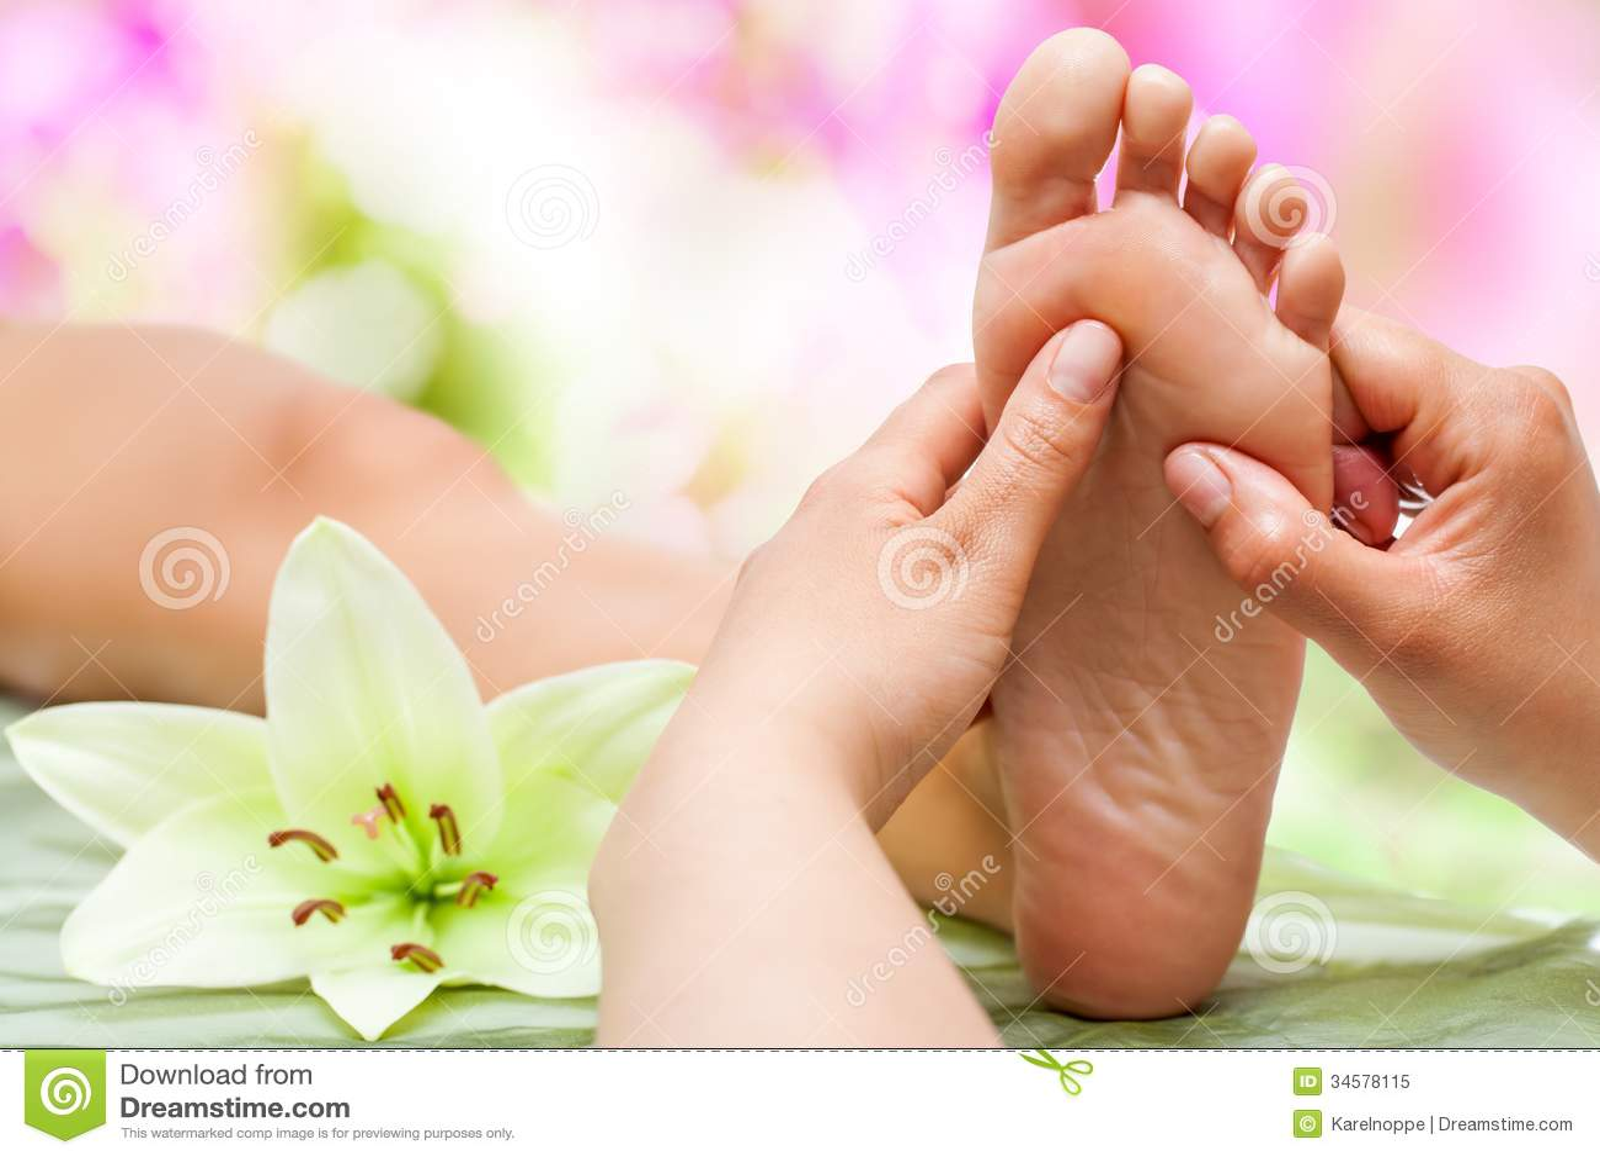 Therapist hands massaging foot.